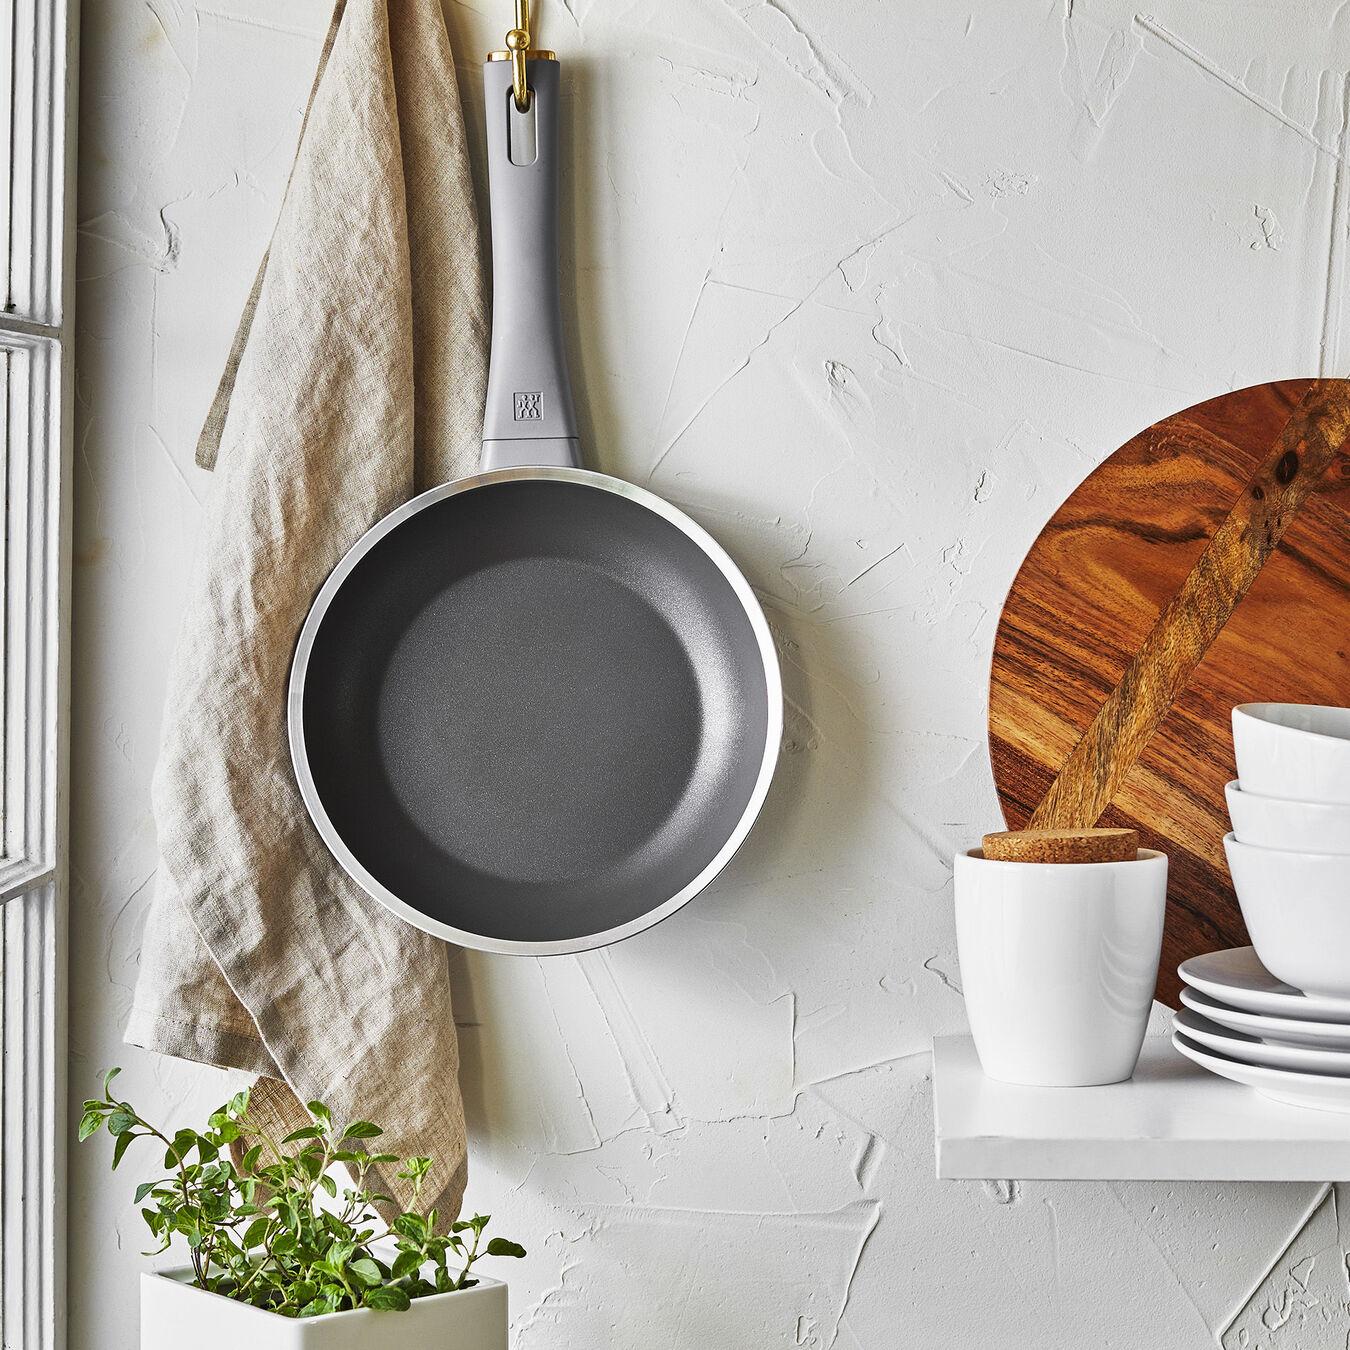 20 cm / 8 inch Frying pan,,large 6